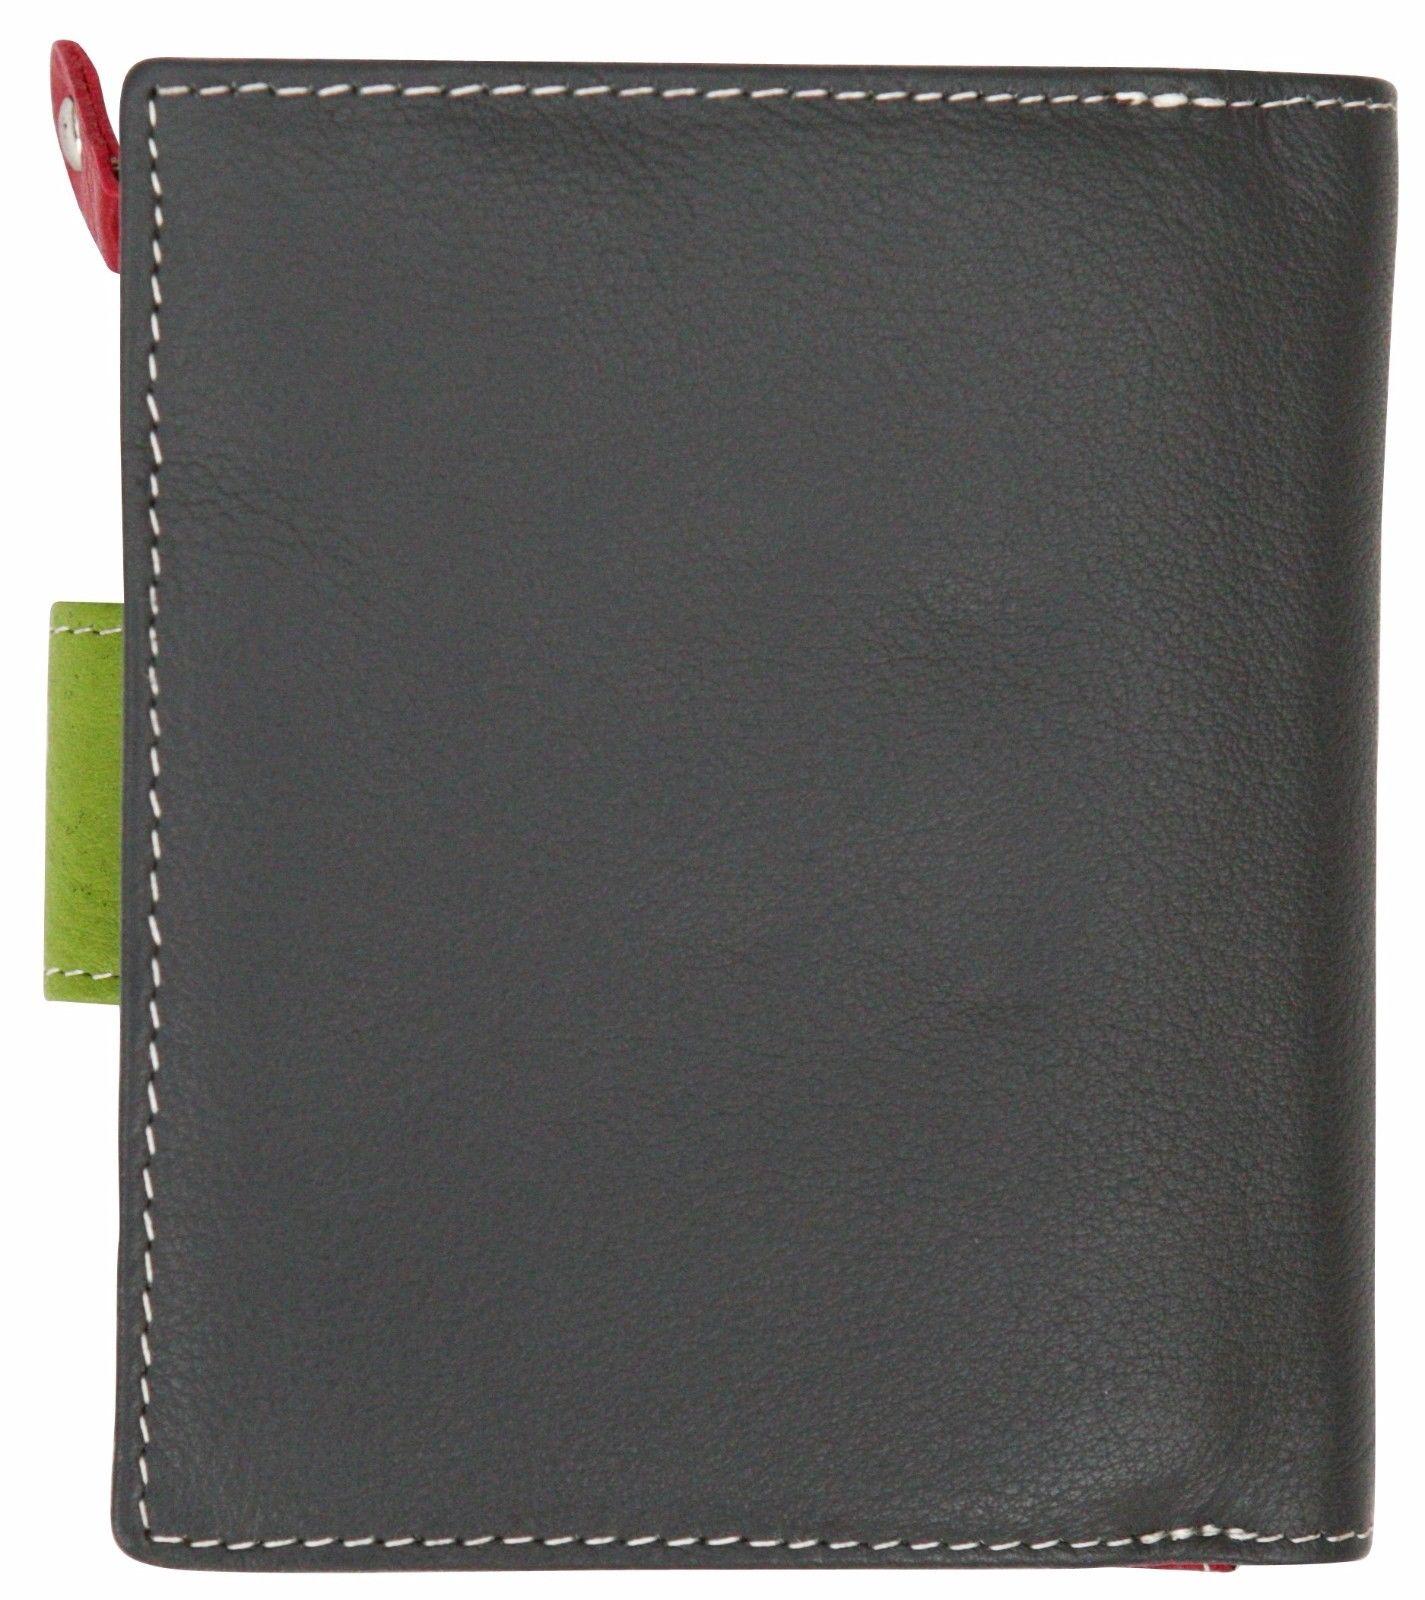 Felda-RFID-onorevoli-MEDAGLIA-amp-Card-Purse-Wallet-Genuine-Leather-Multi-SOFT-BOX-REGALO miniatura 38